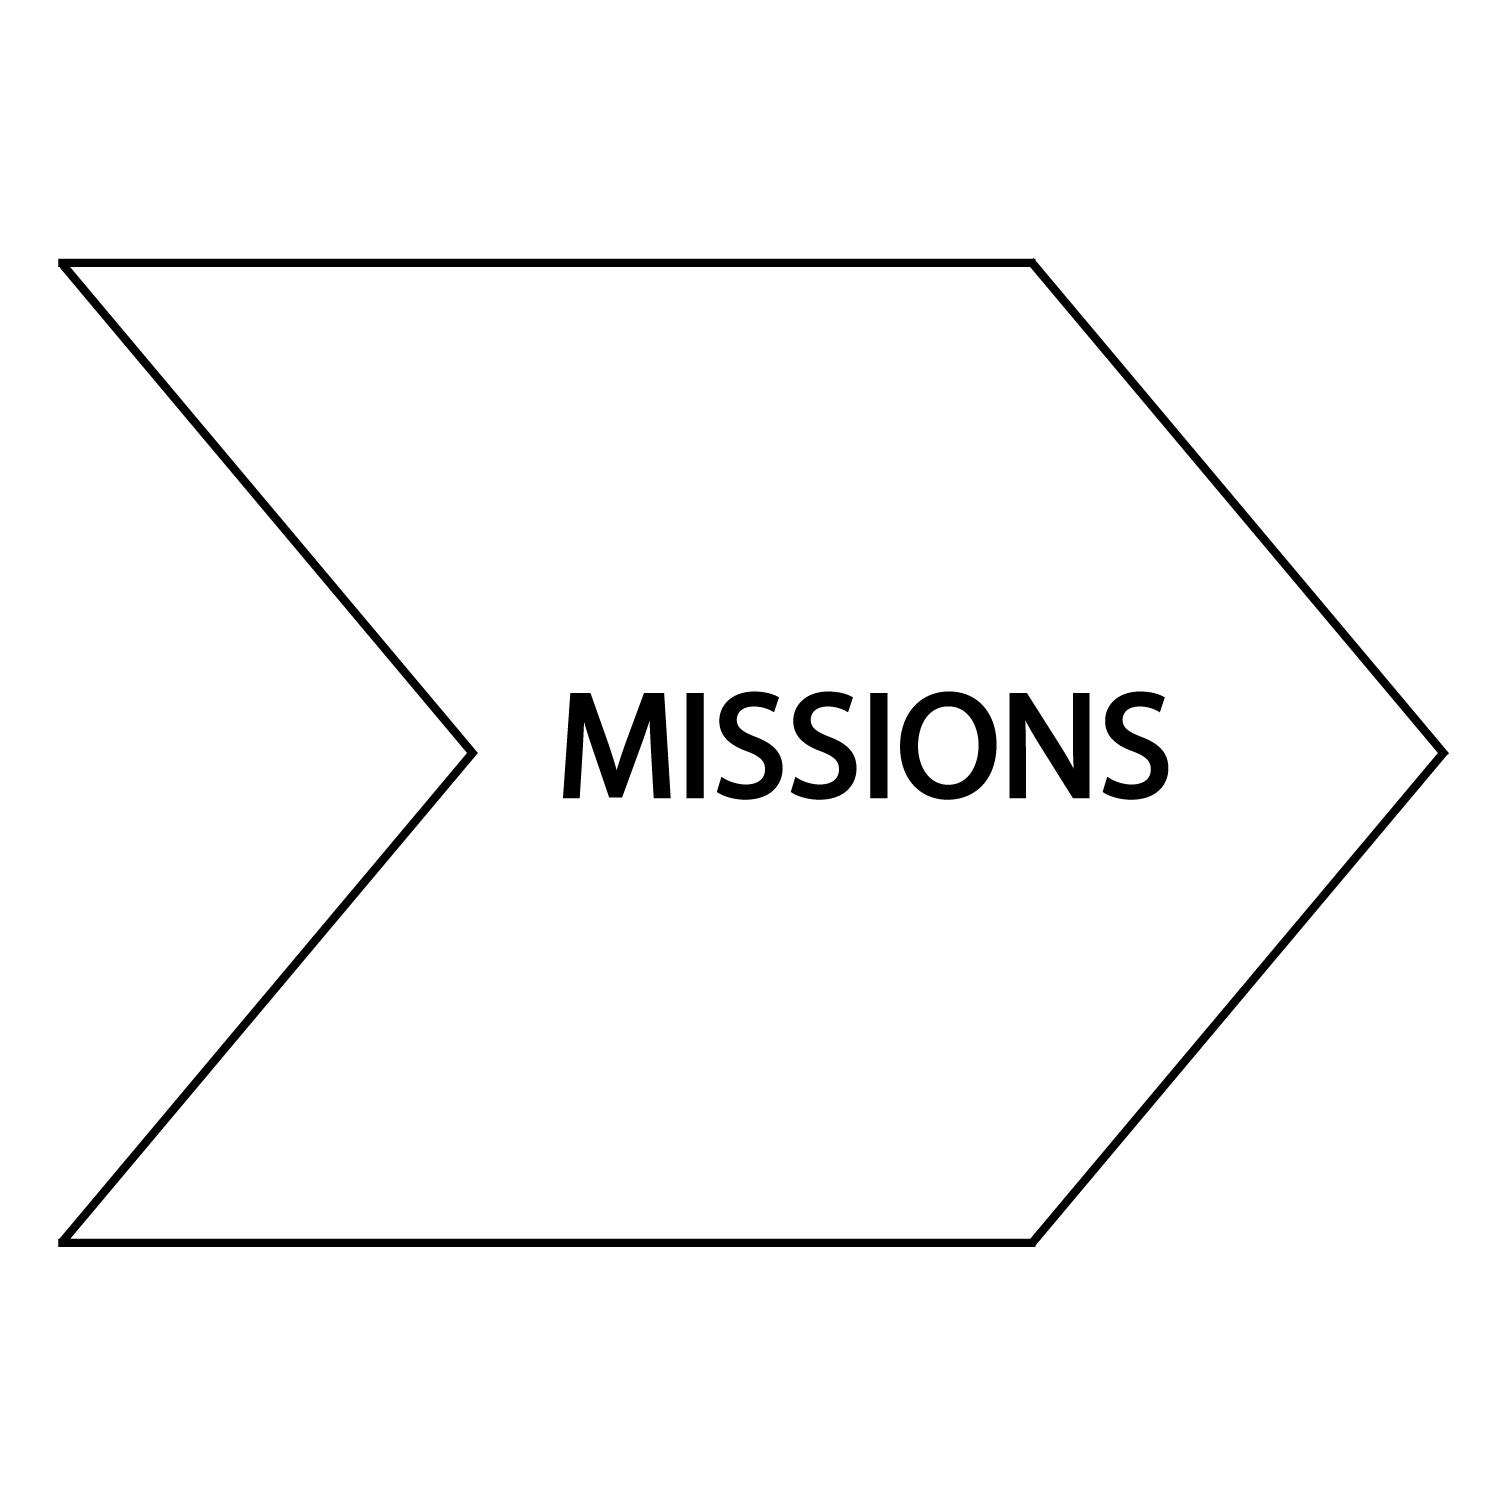 Missions Arrow.jpg